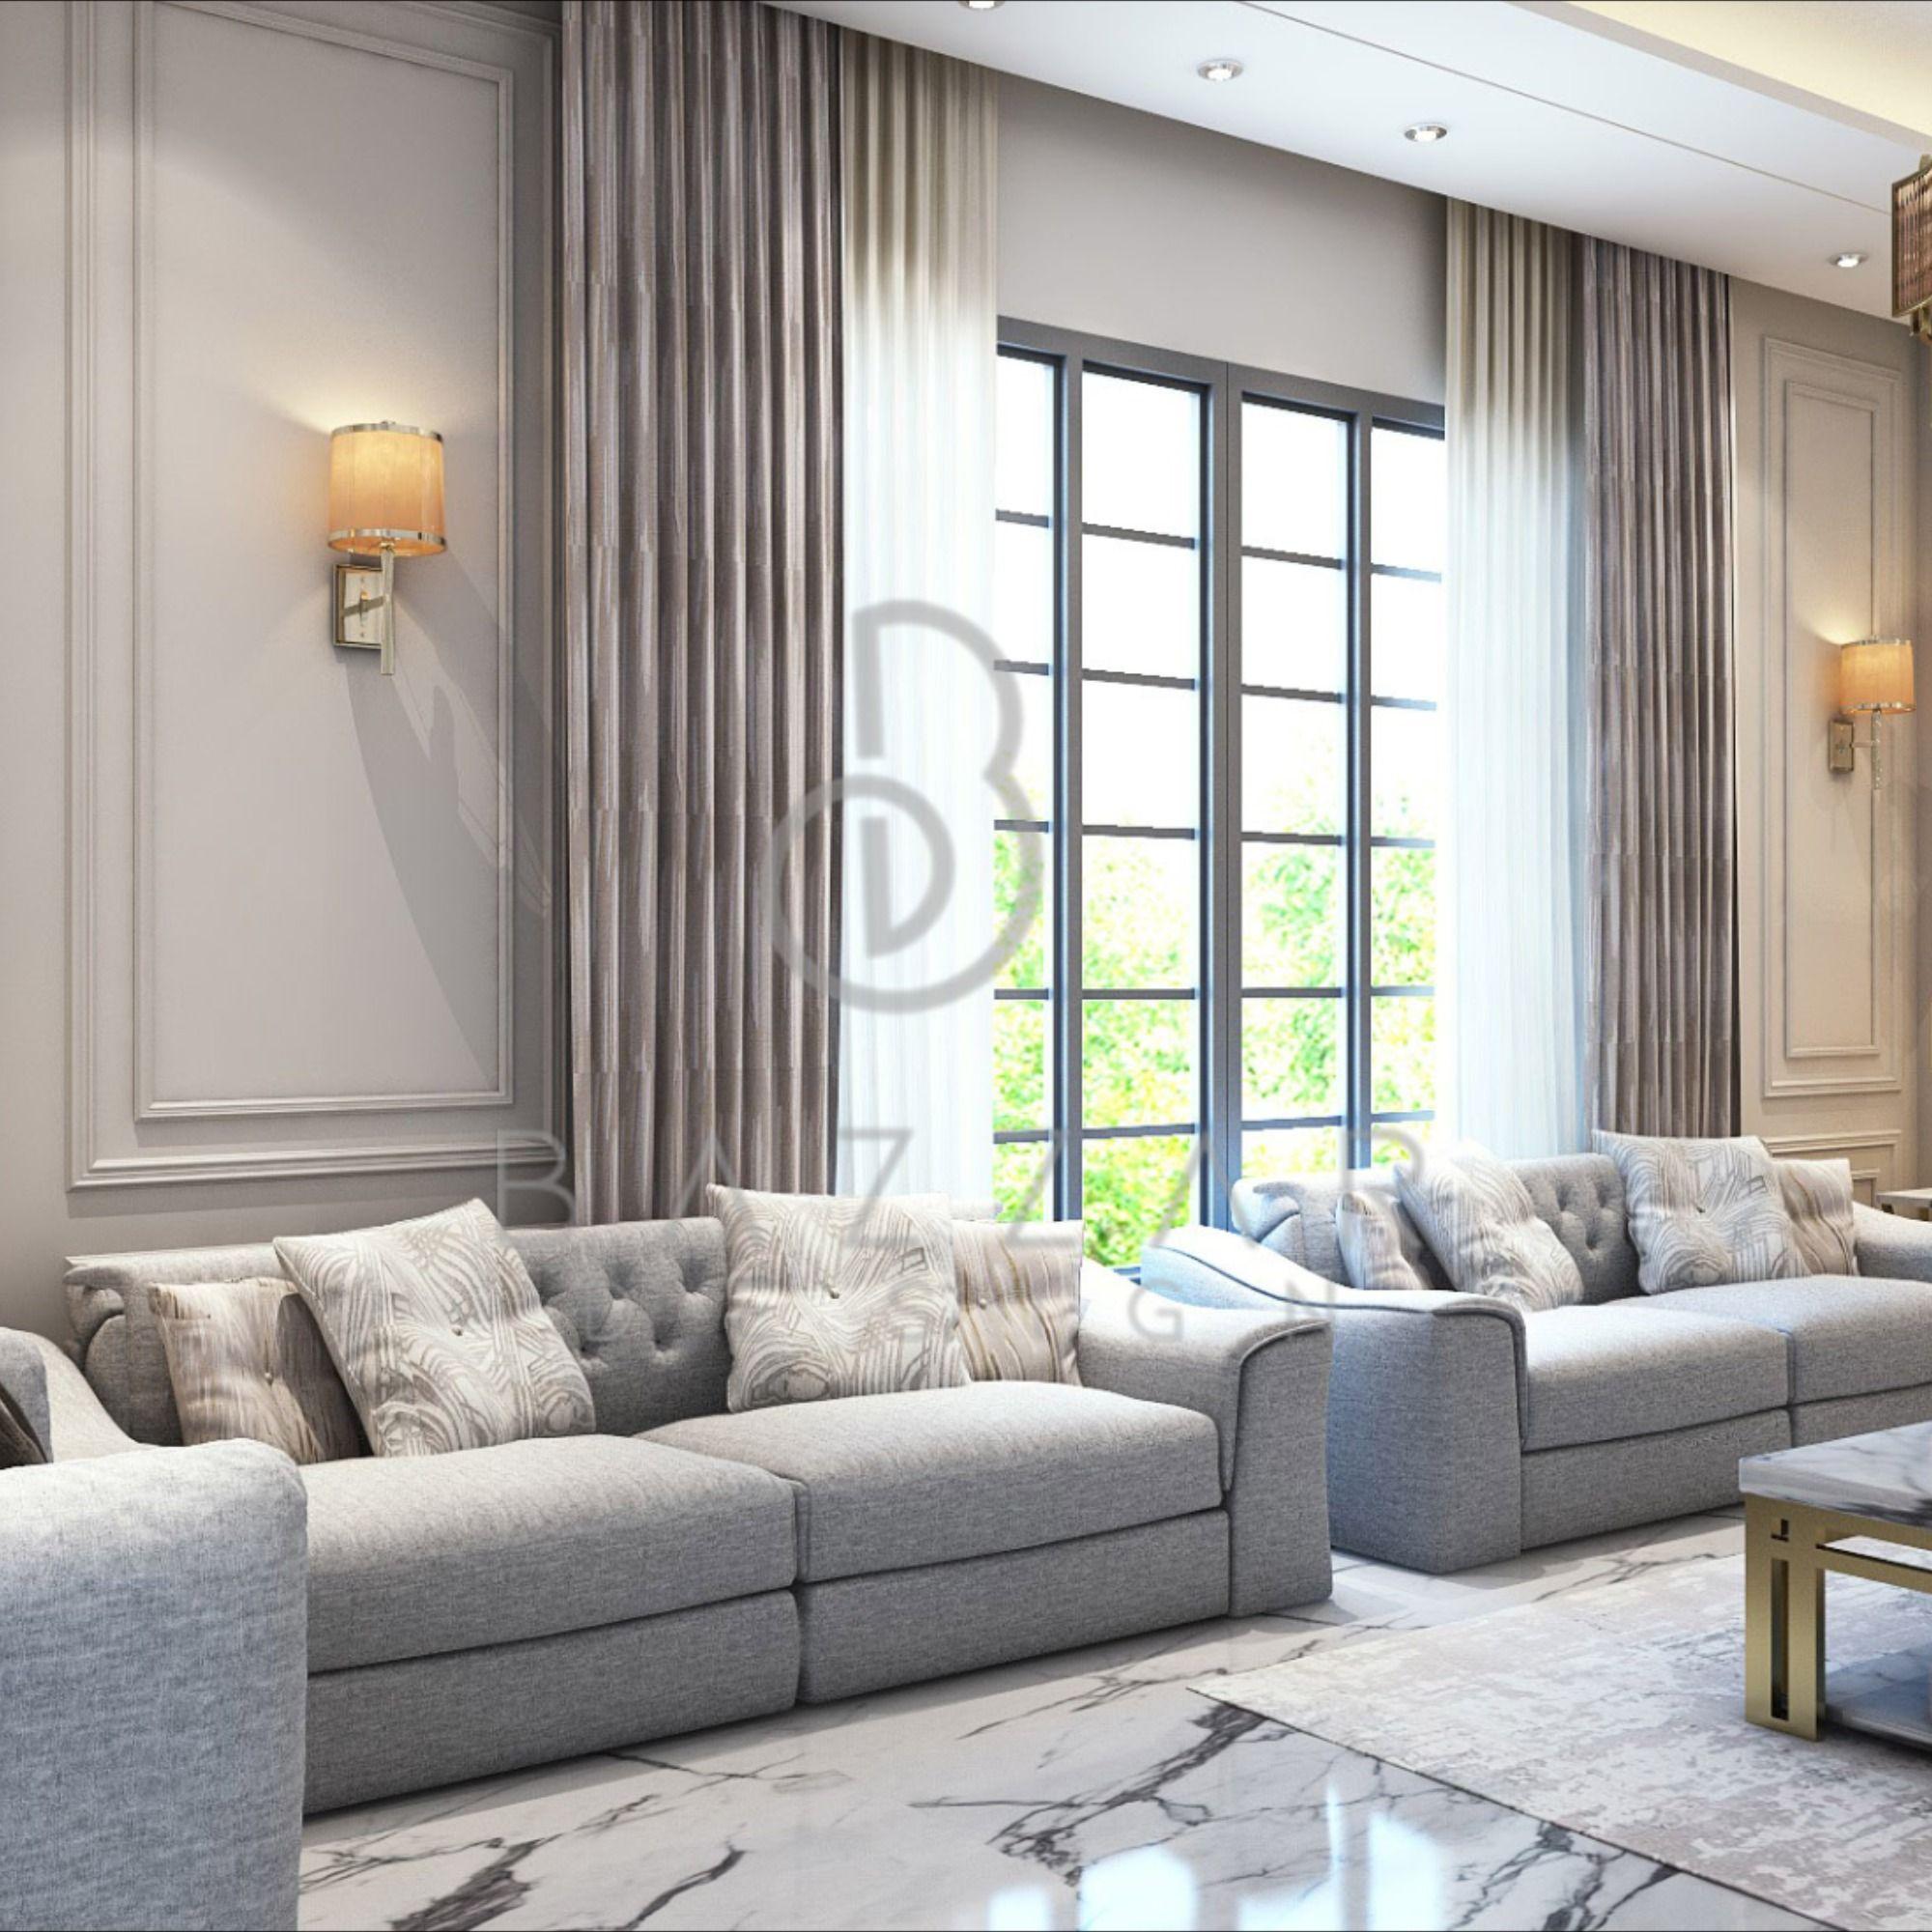 Small Cozy Living Room Design Ideas In 2020 Cozy Living Room Design Living Room Designs Cozy Living Rooms